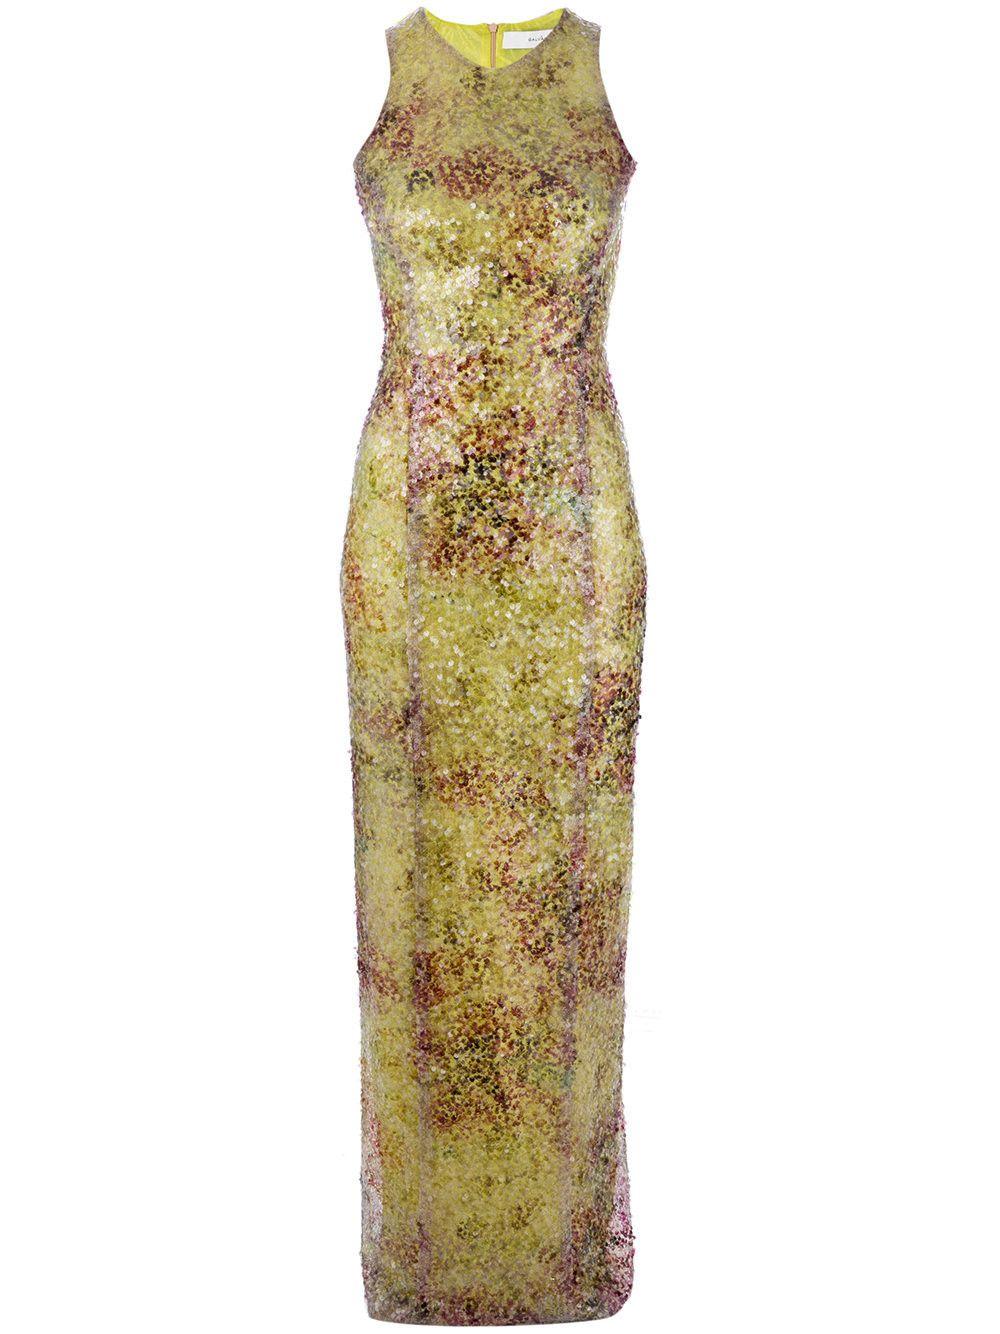 Sequin Racer-back Dress